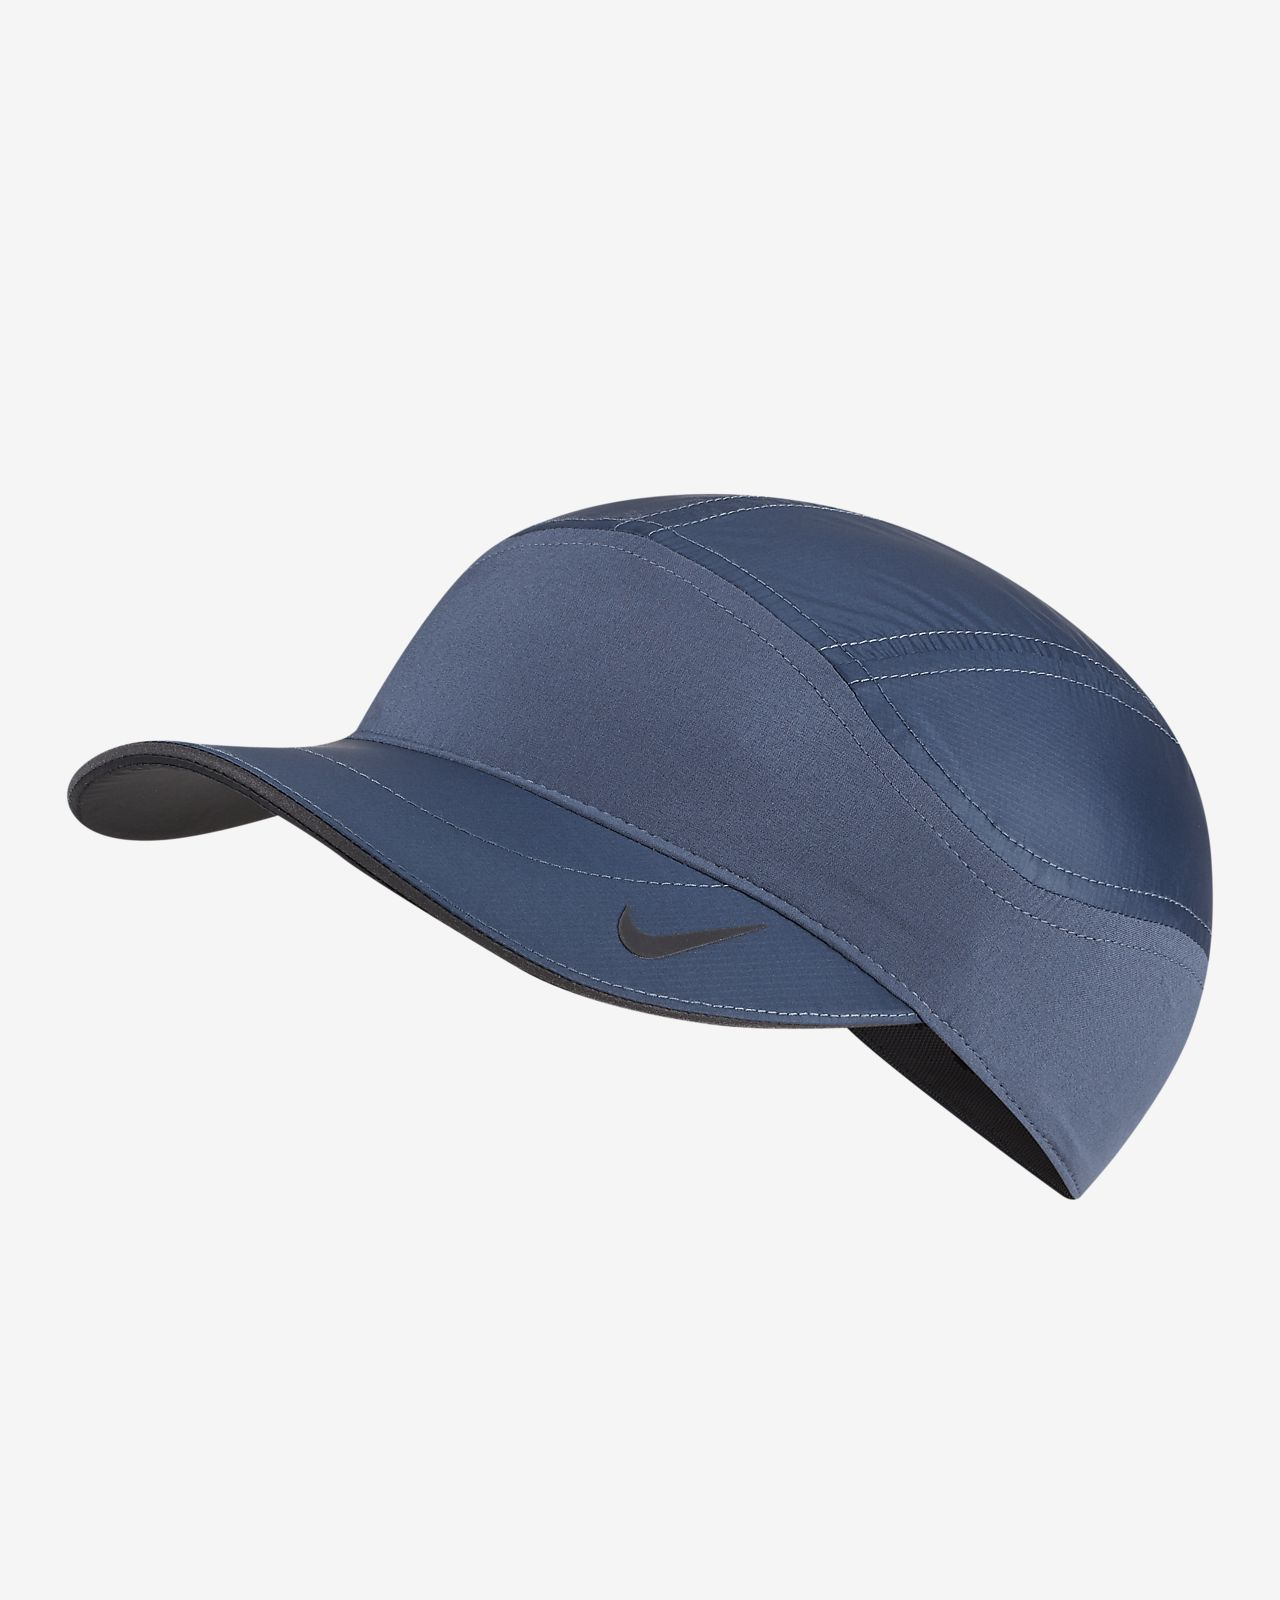 fama mondiale outlet online grande sconto del 2019 Cappello regolabile da running Nike Tailwind